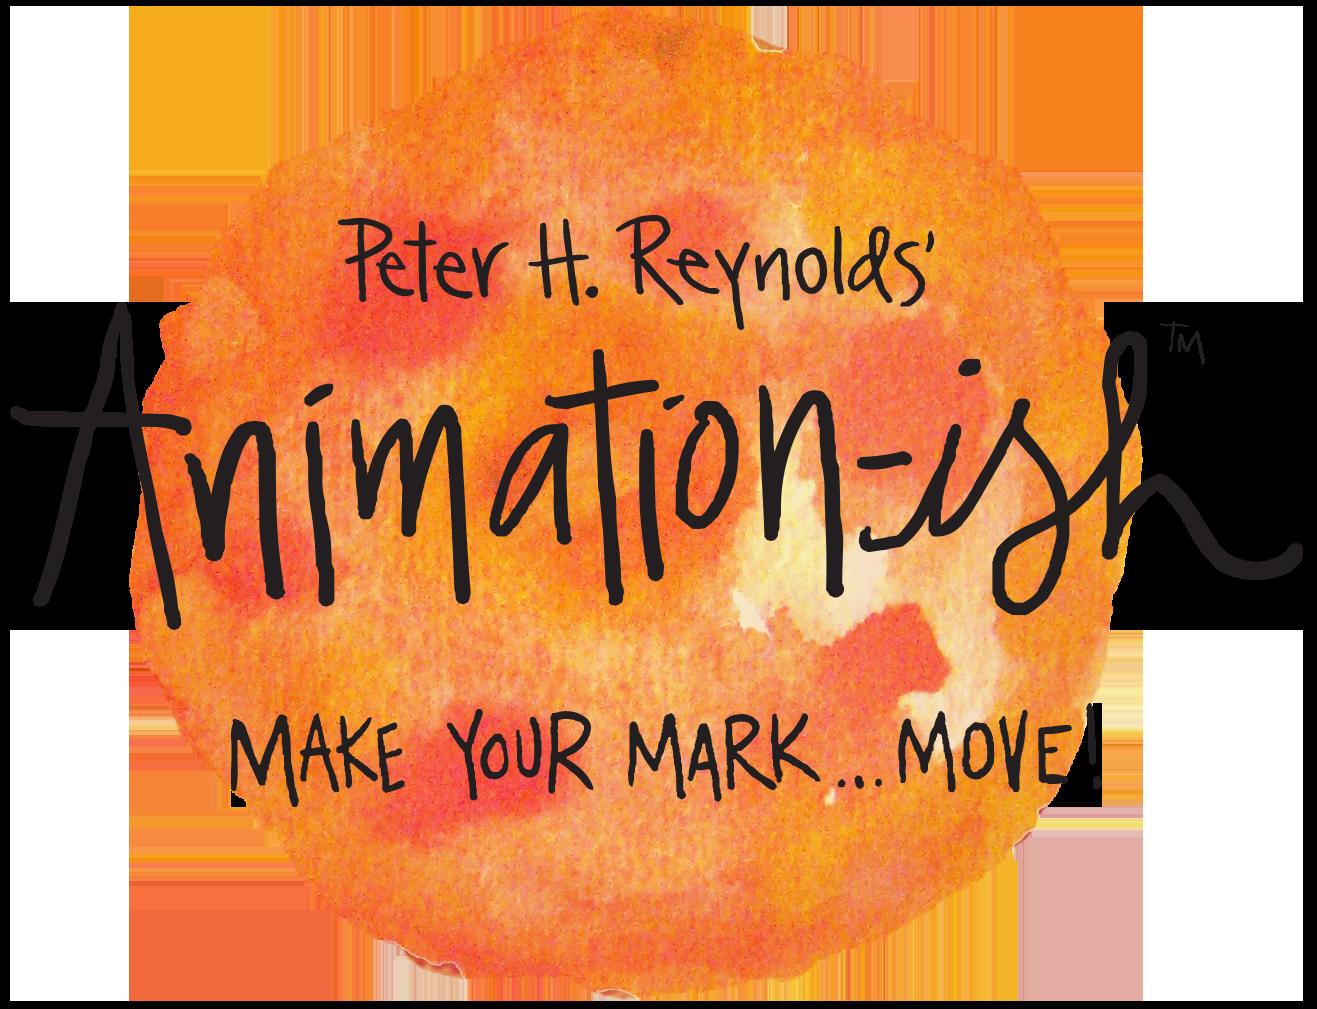 Animation-ish_logo.png